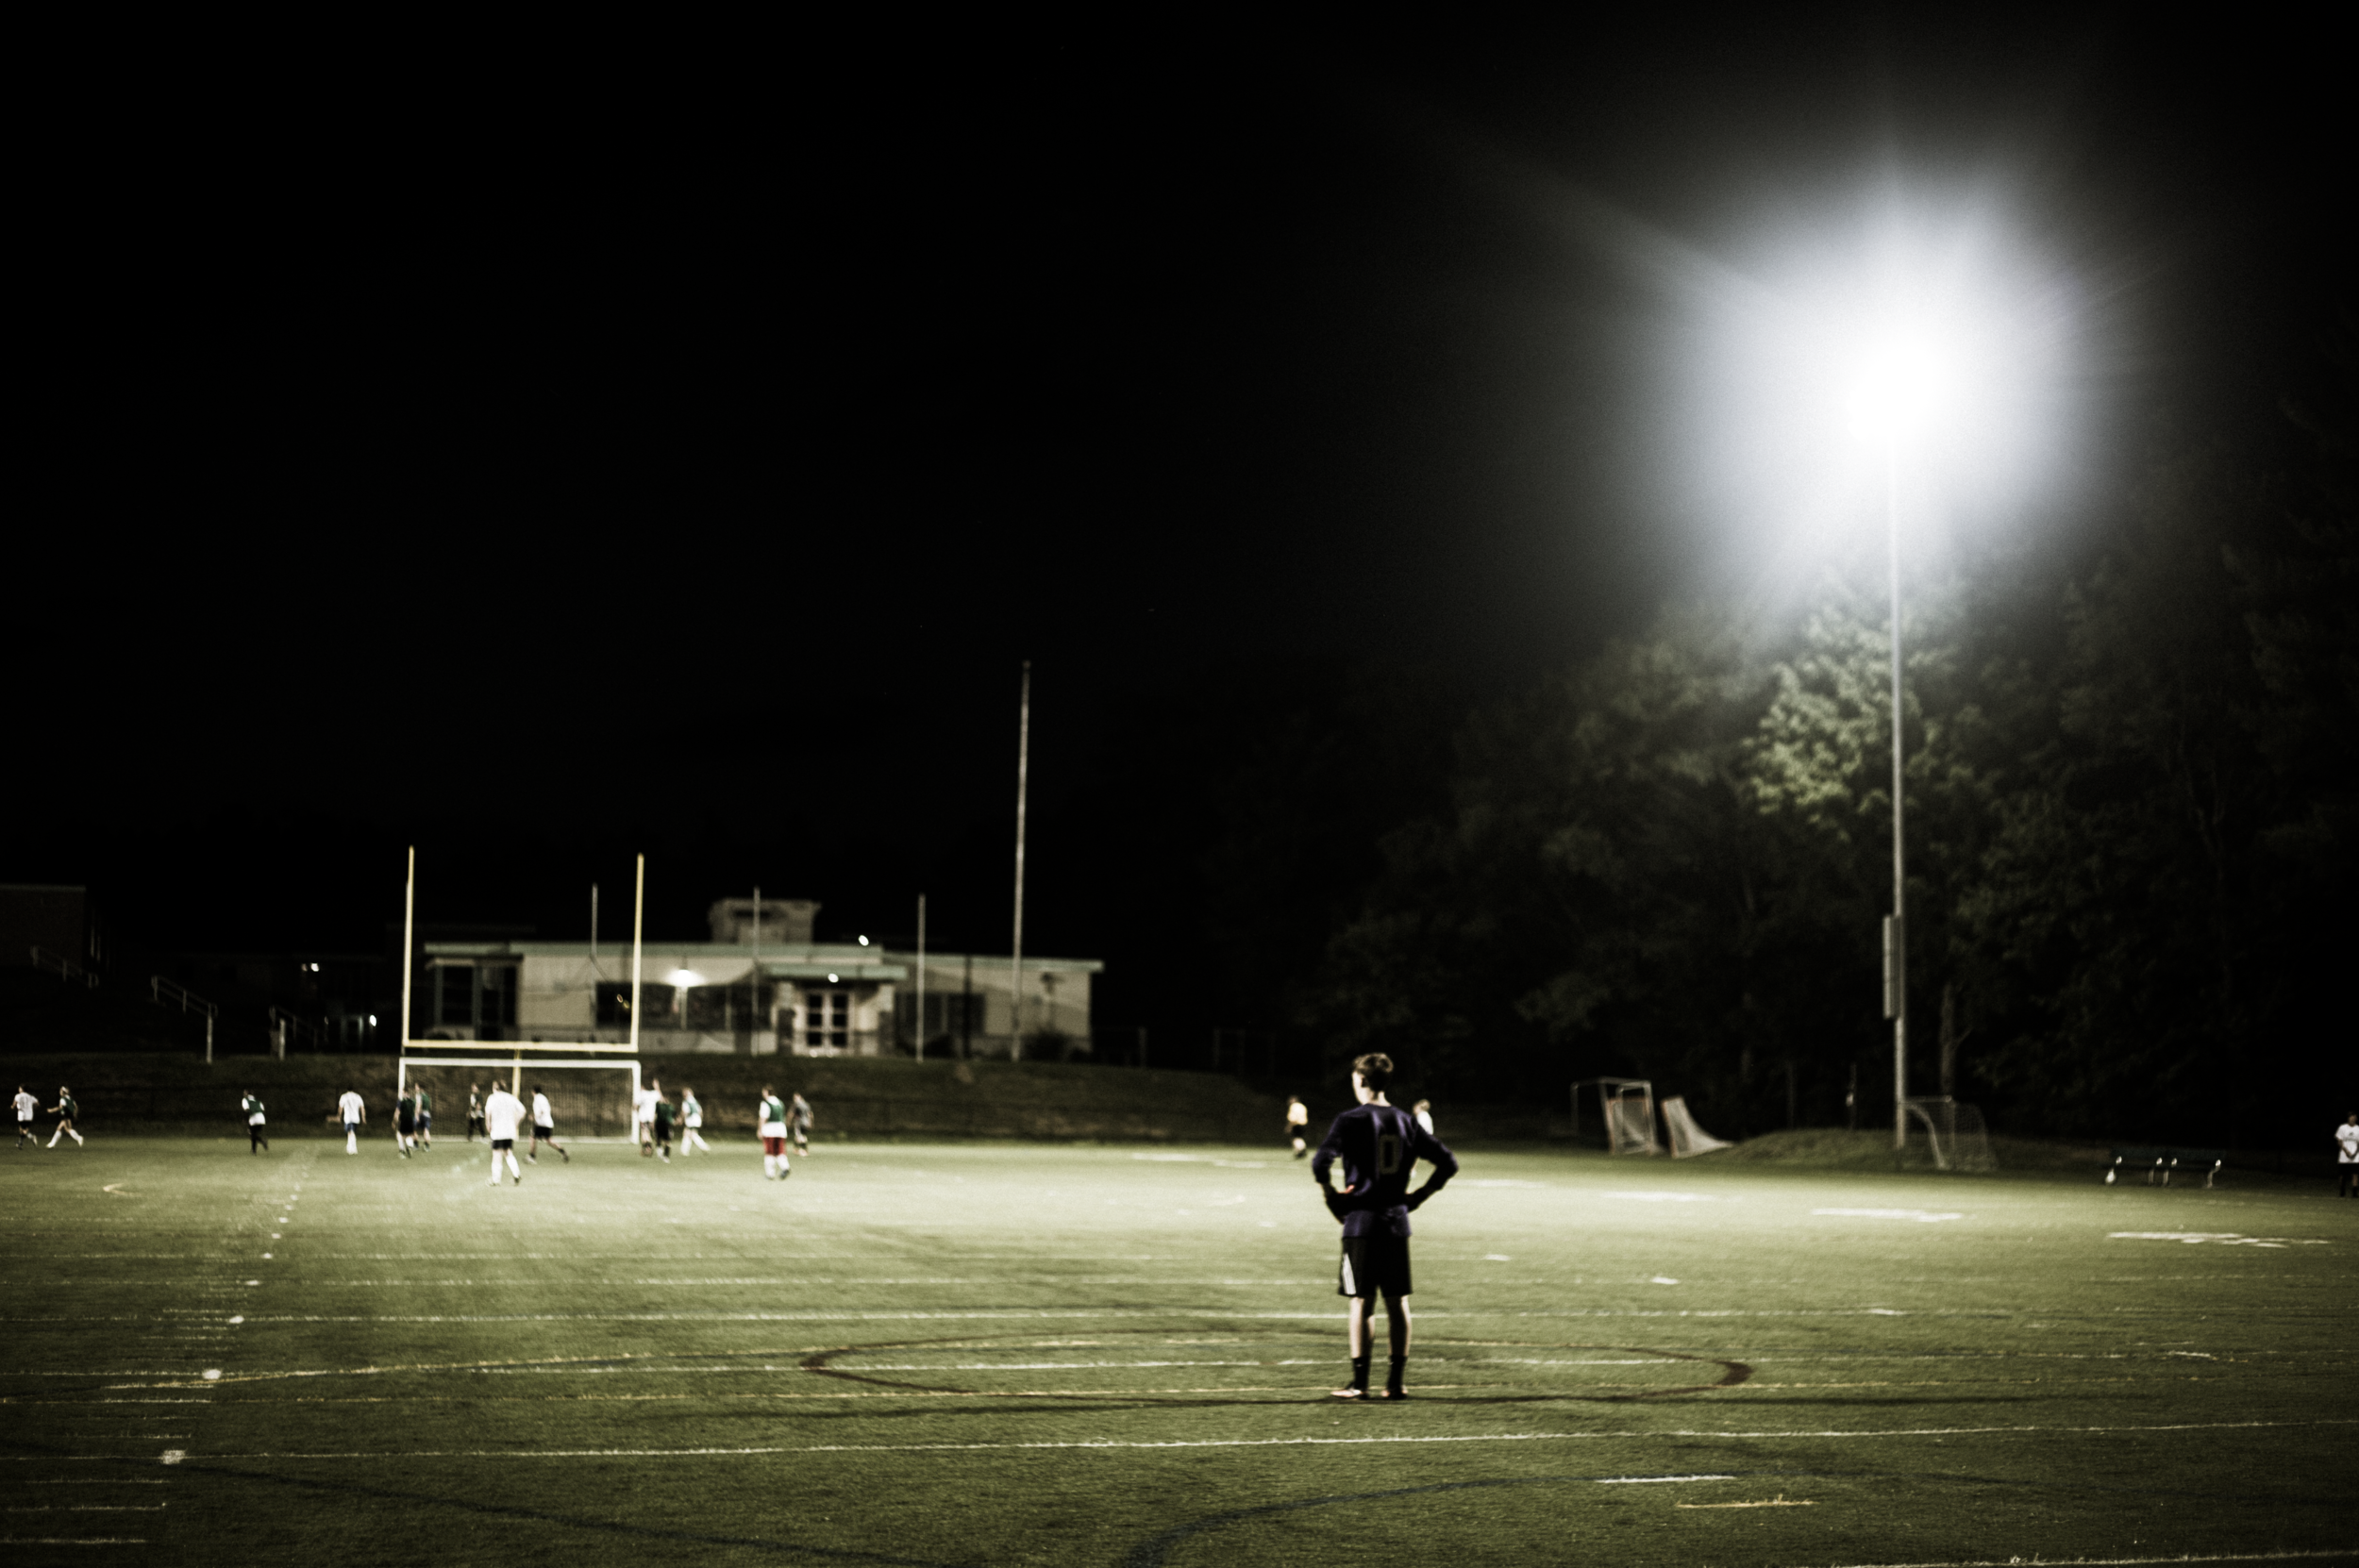 Goalie in the Lights